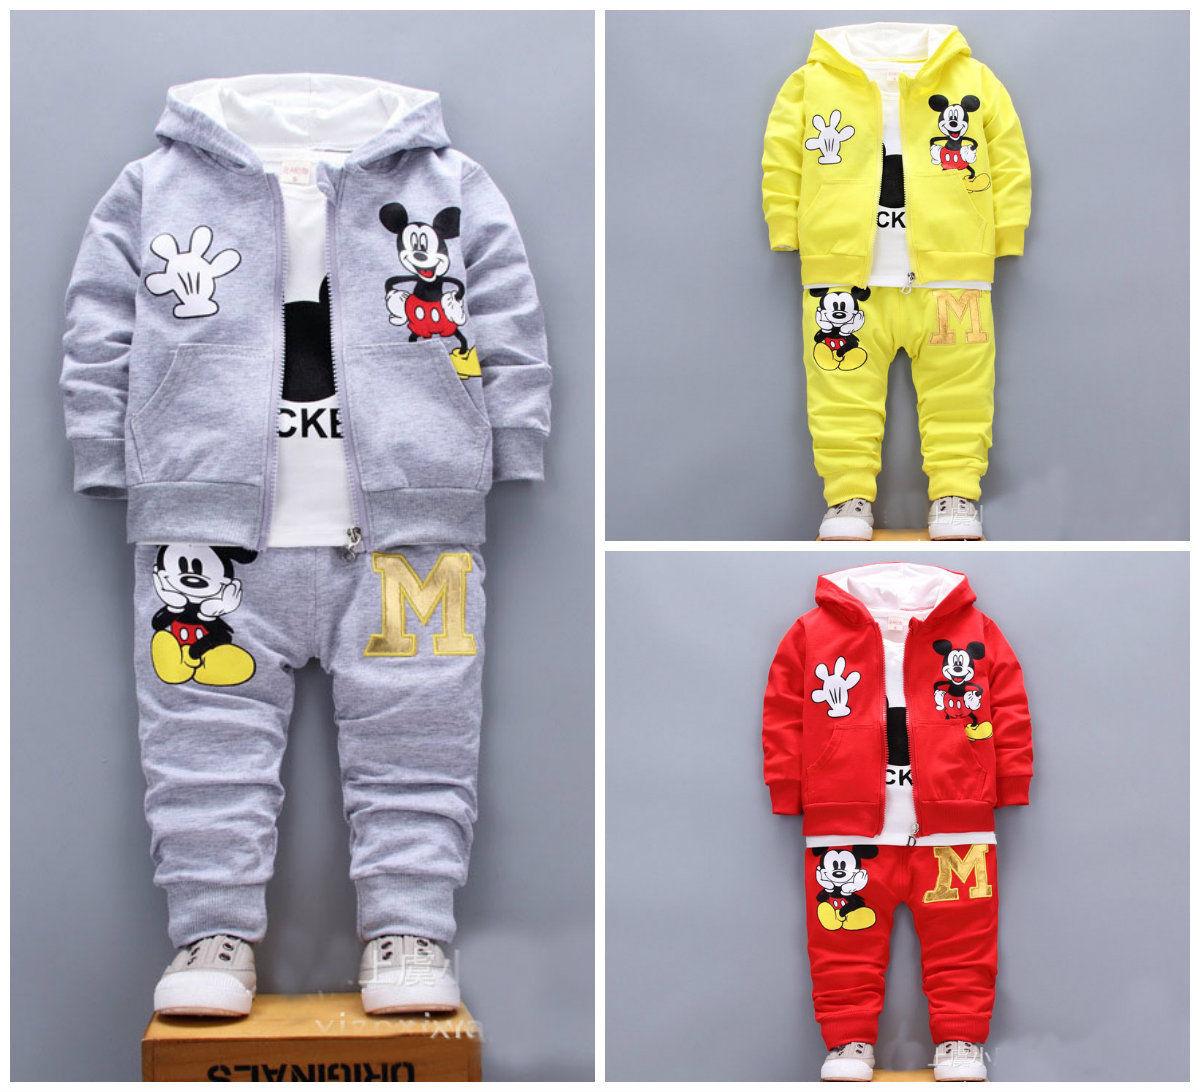 3pcs Baby toddler clothes boys coat+T shirt pants tracksuit outfits set cartoon